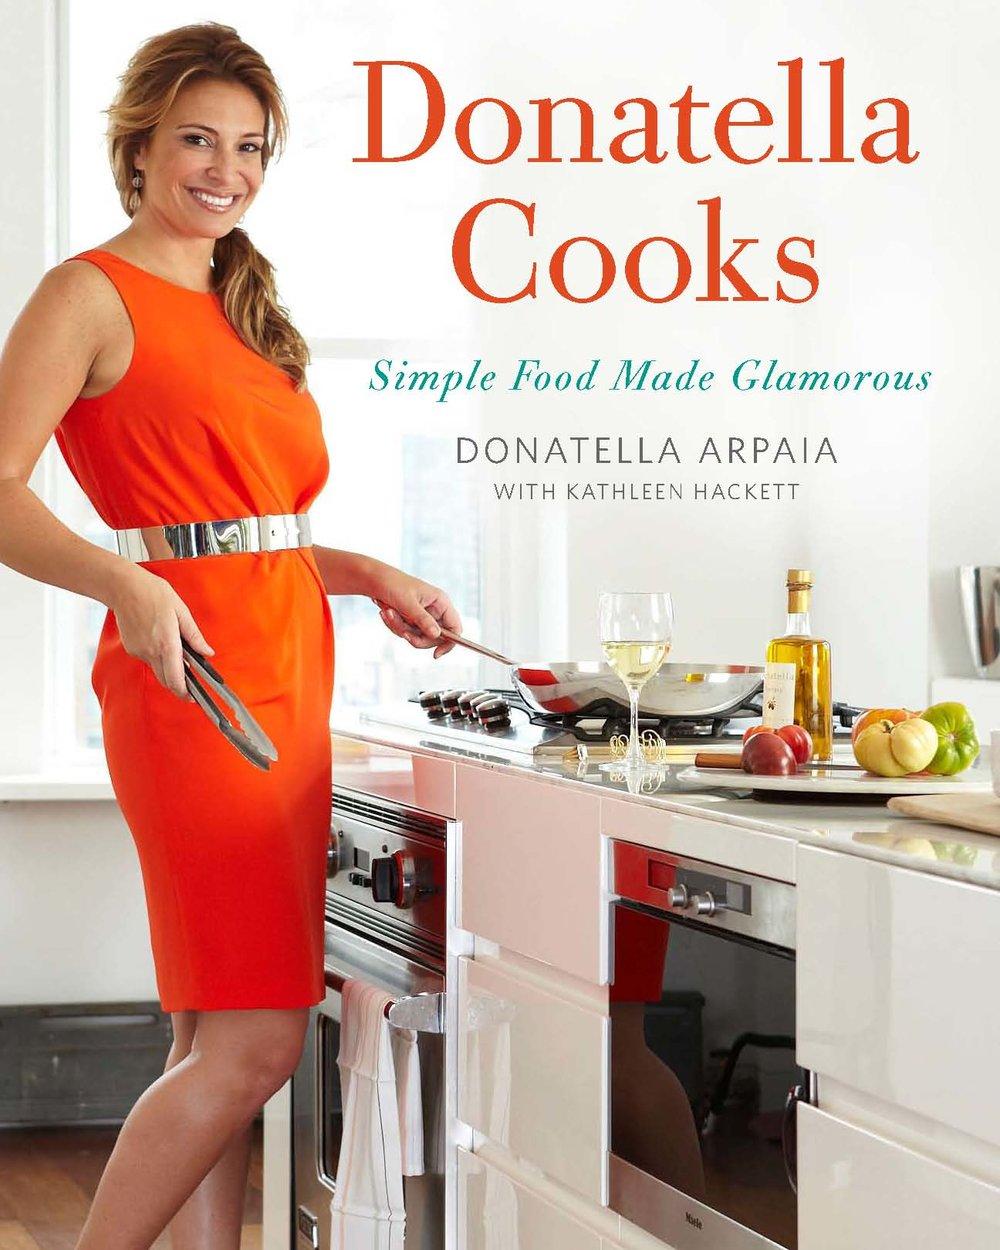 Donatella_Cooks.jpg